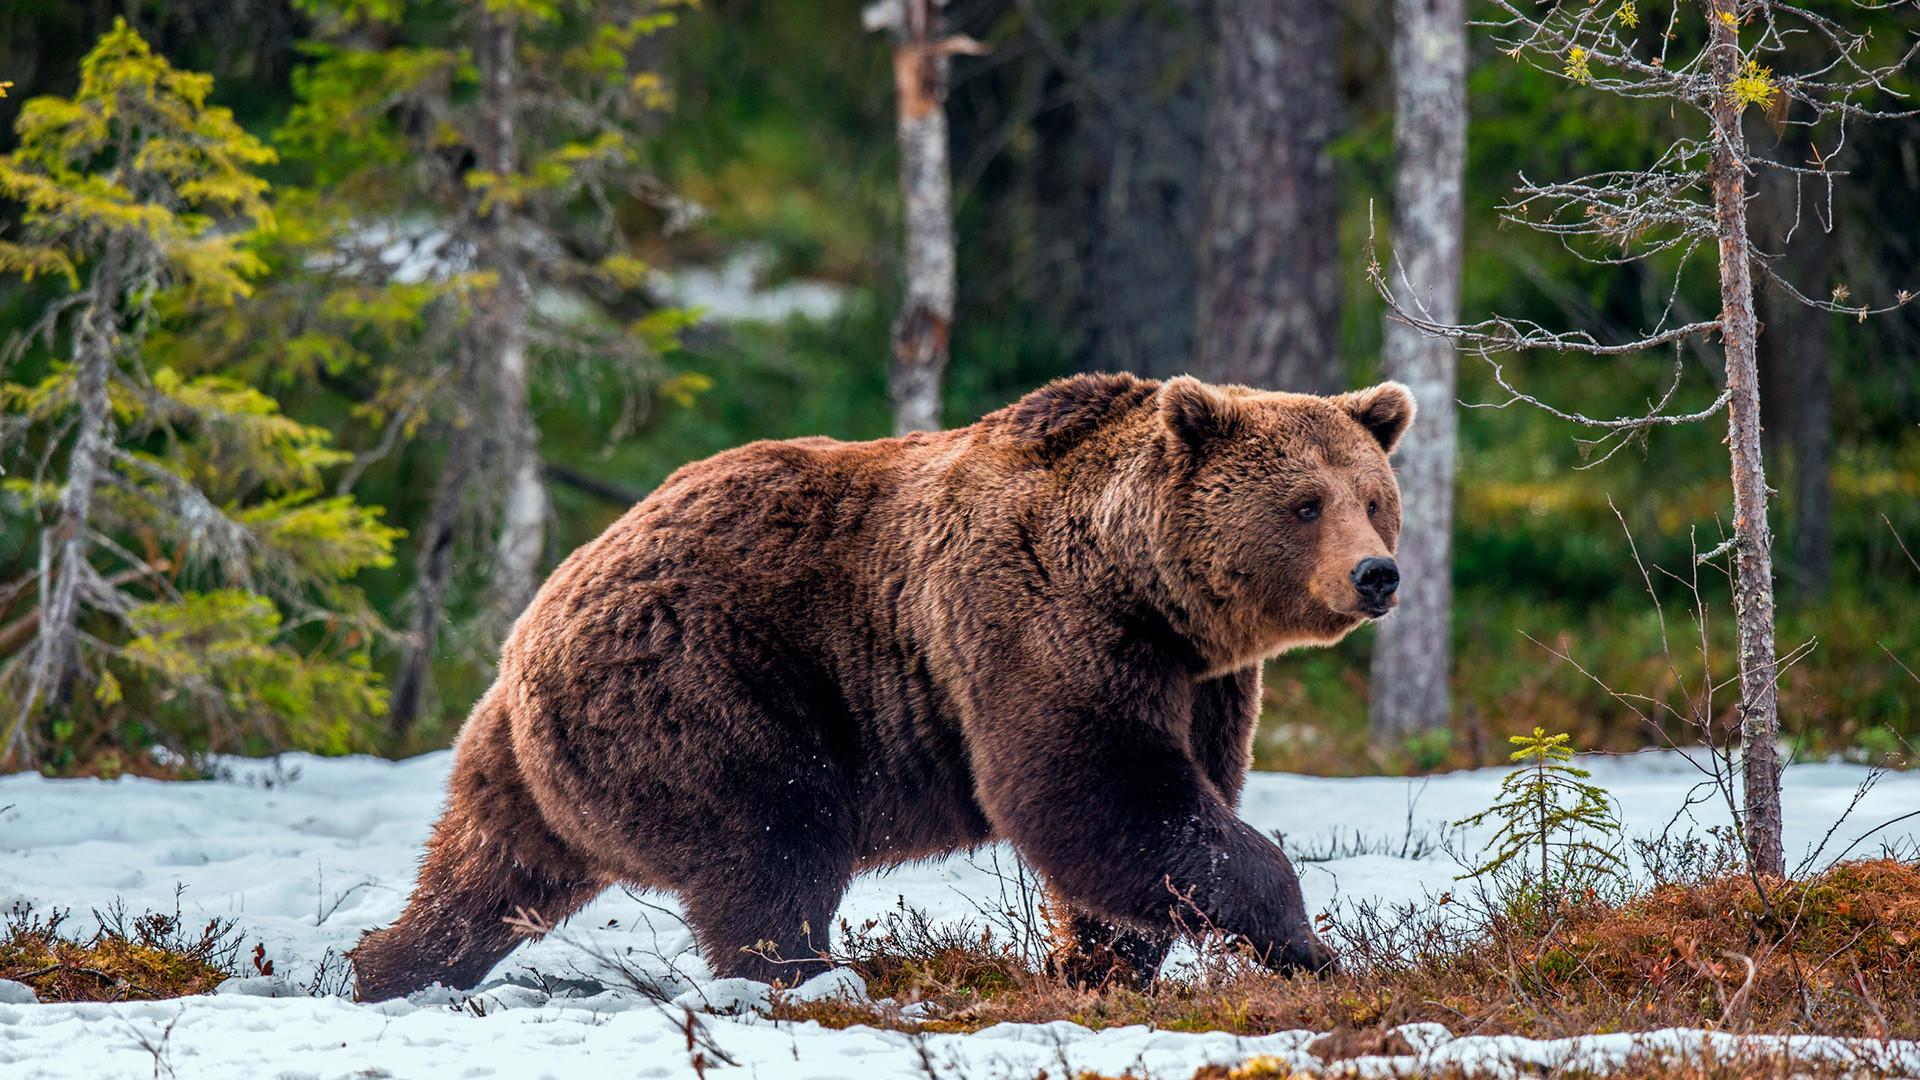 Европски мрки медвед у дивљини током пролећа.